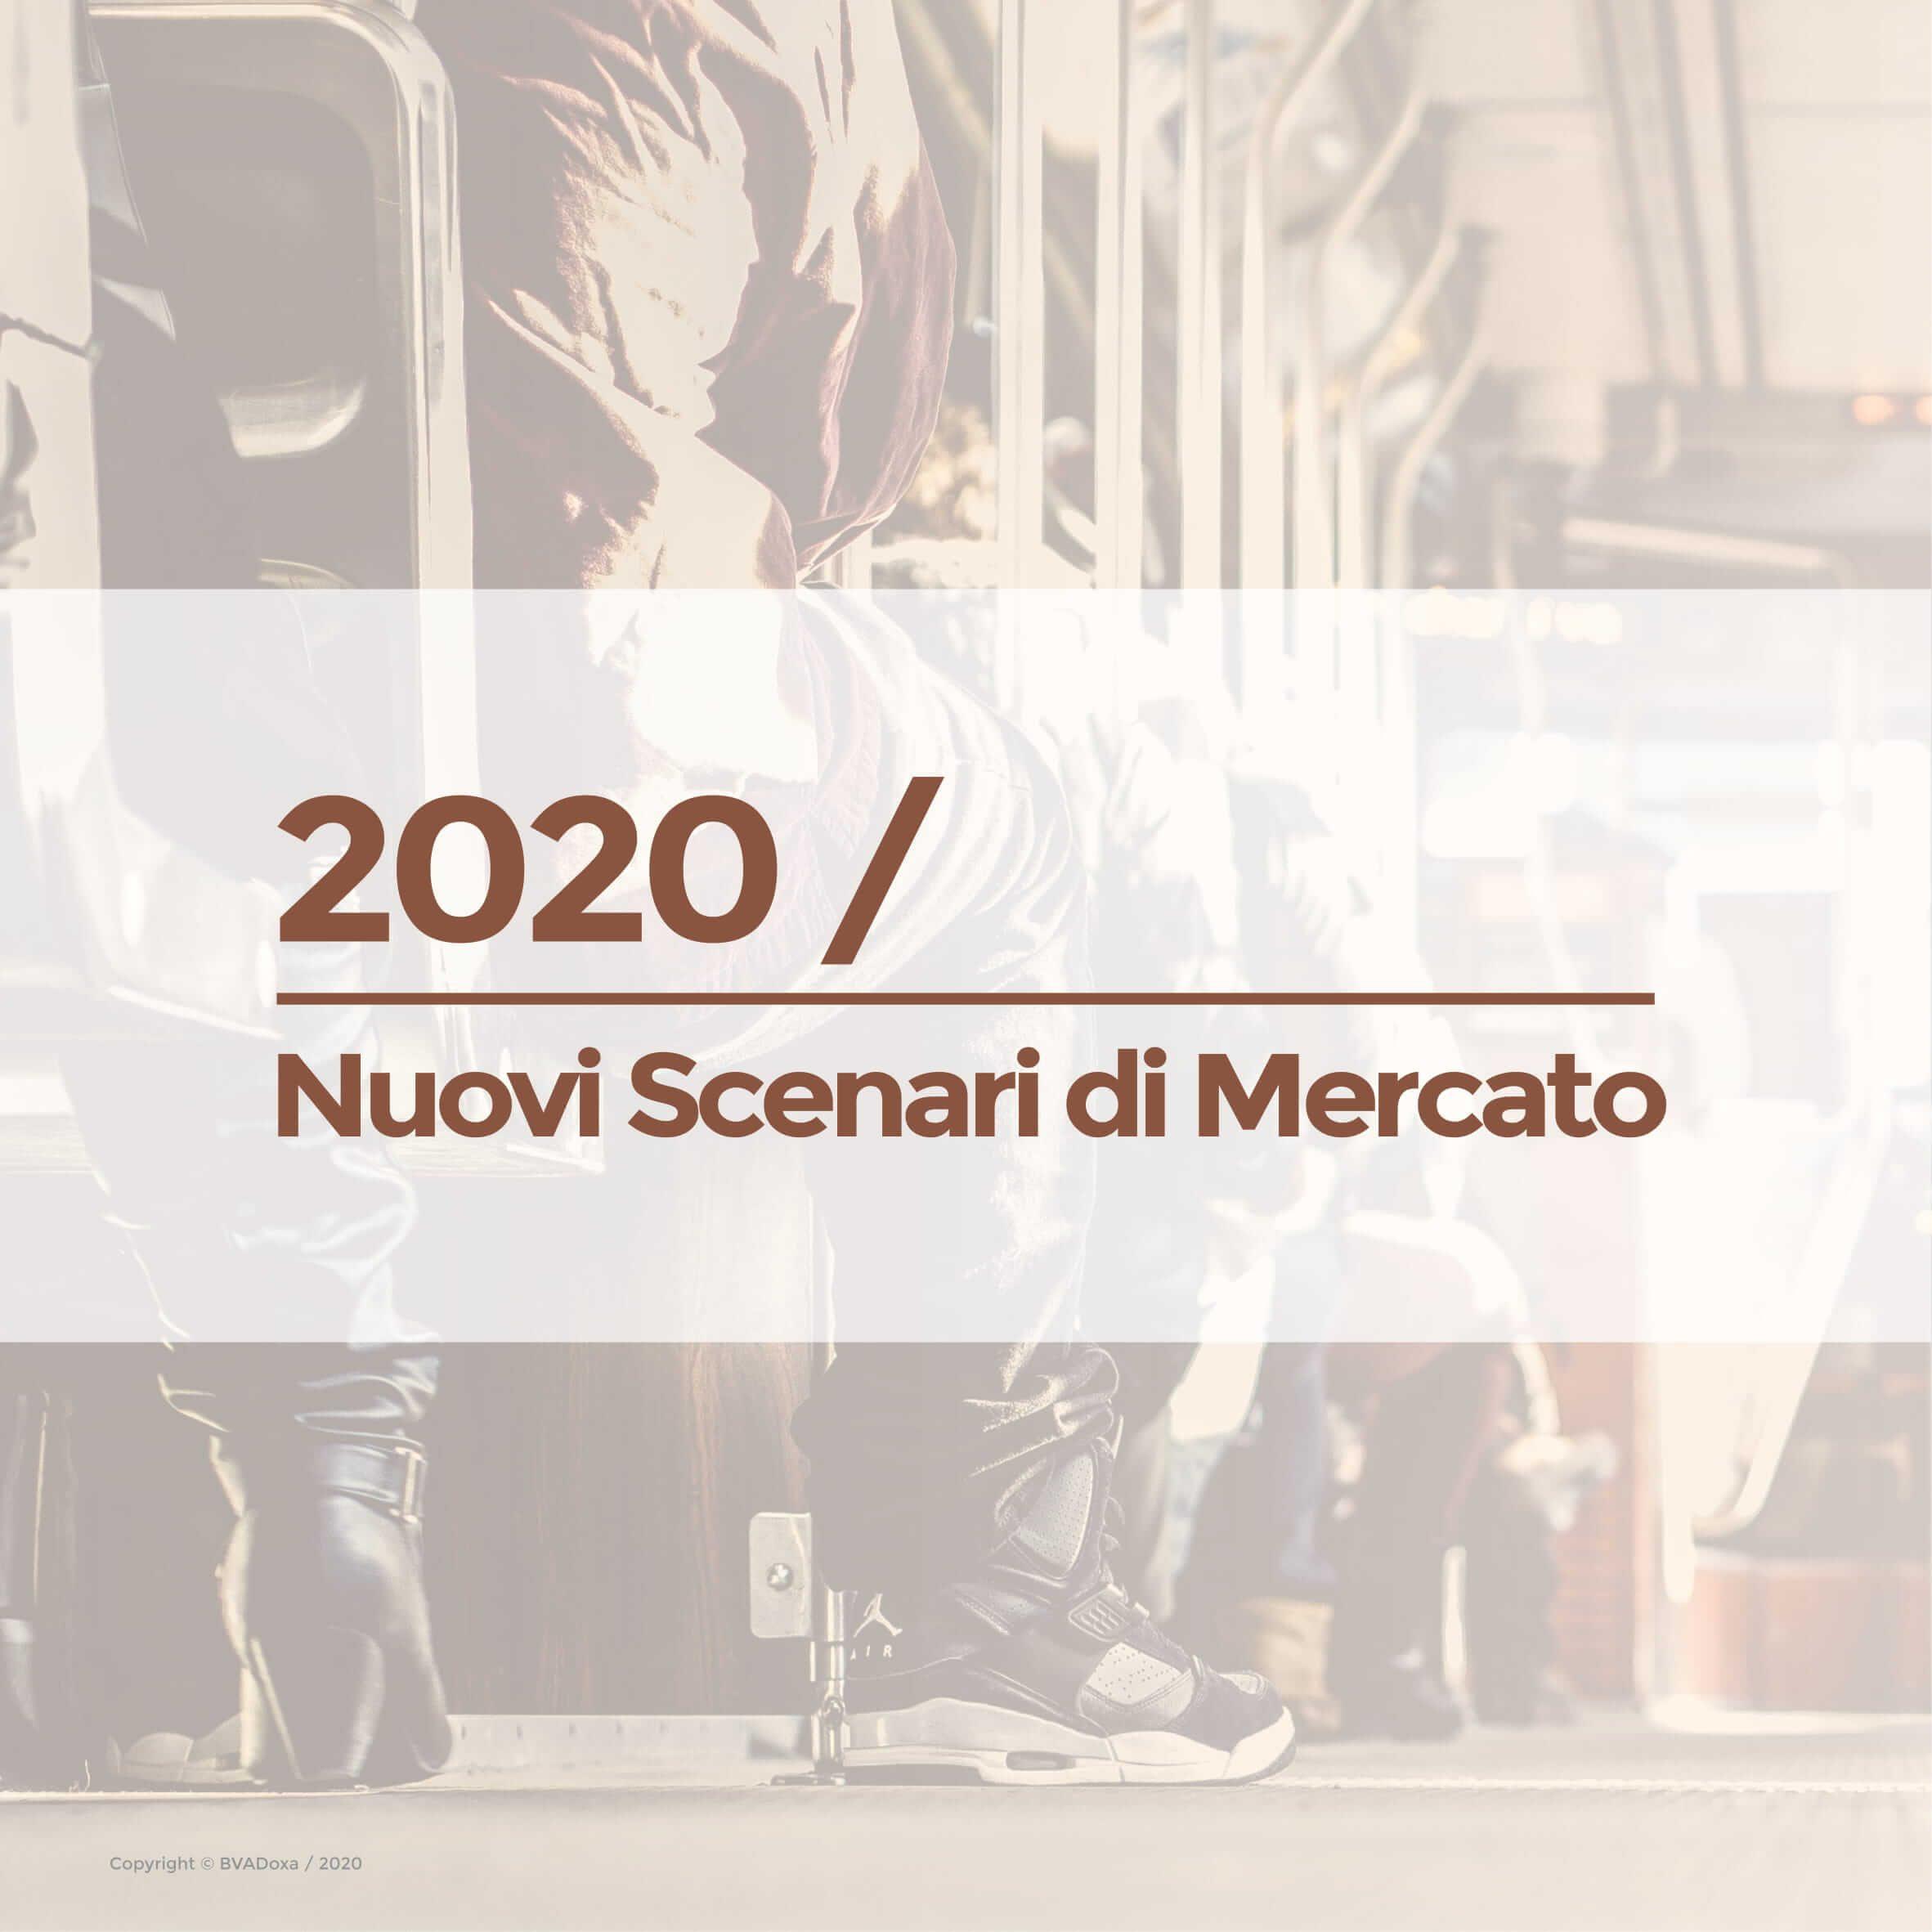 Bva Doxa Nuovi Scenari 2020 Short 02